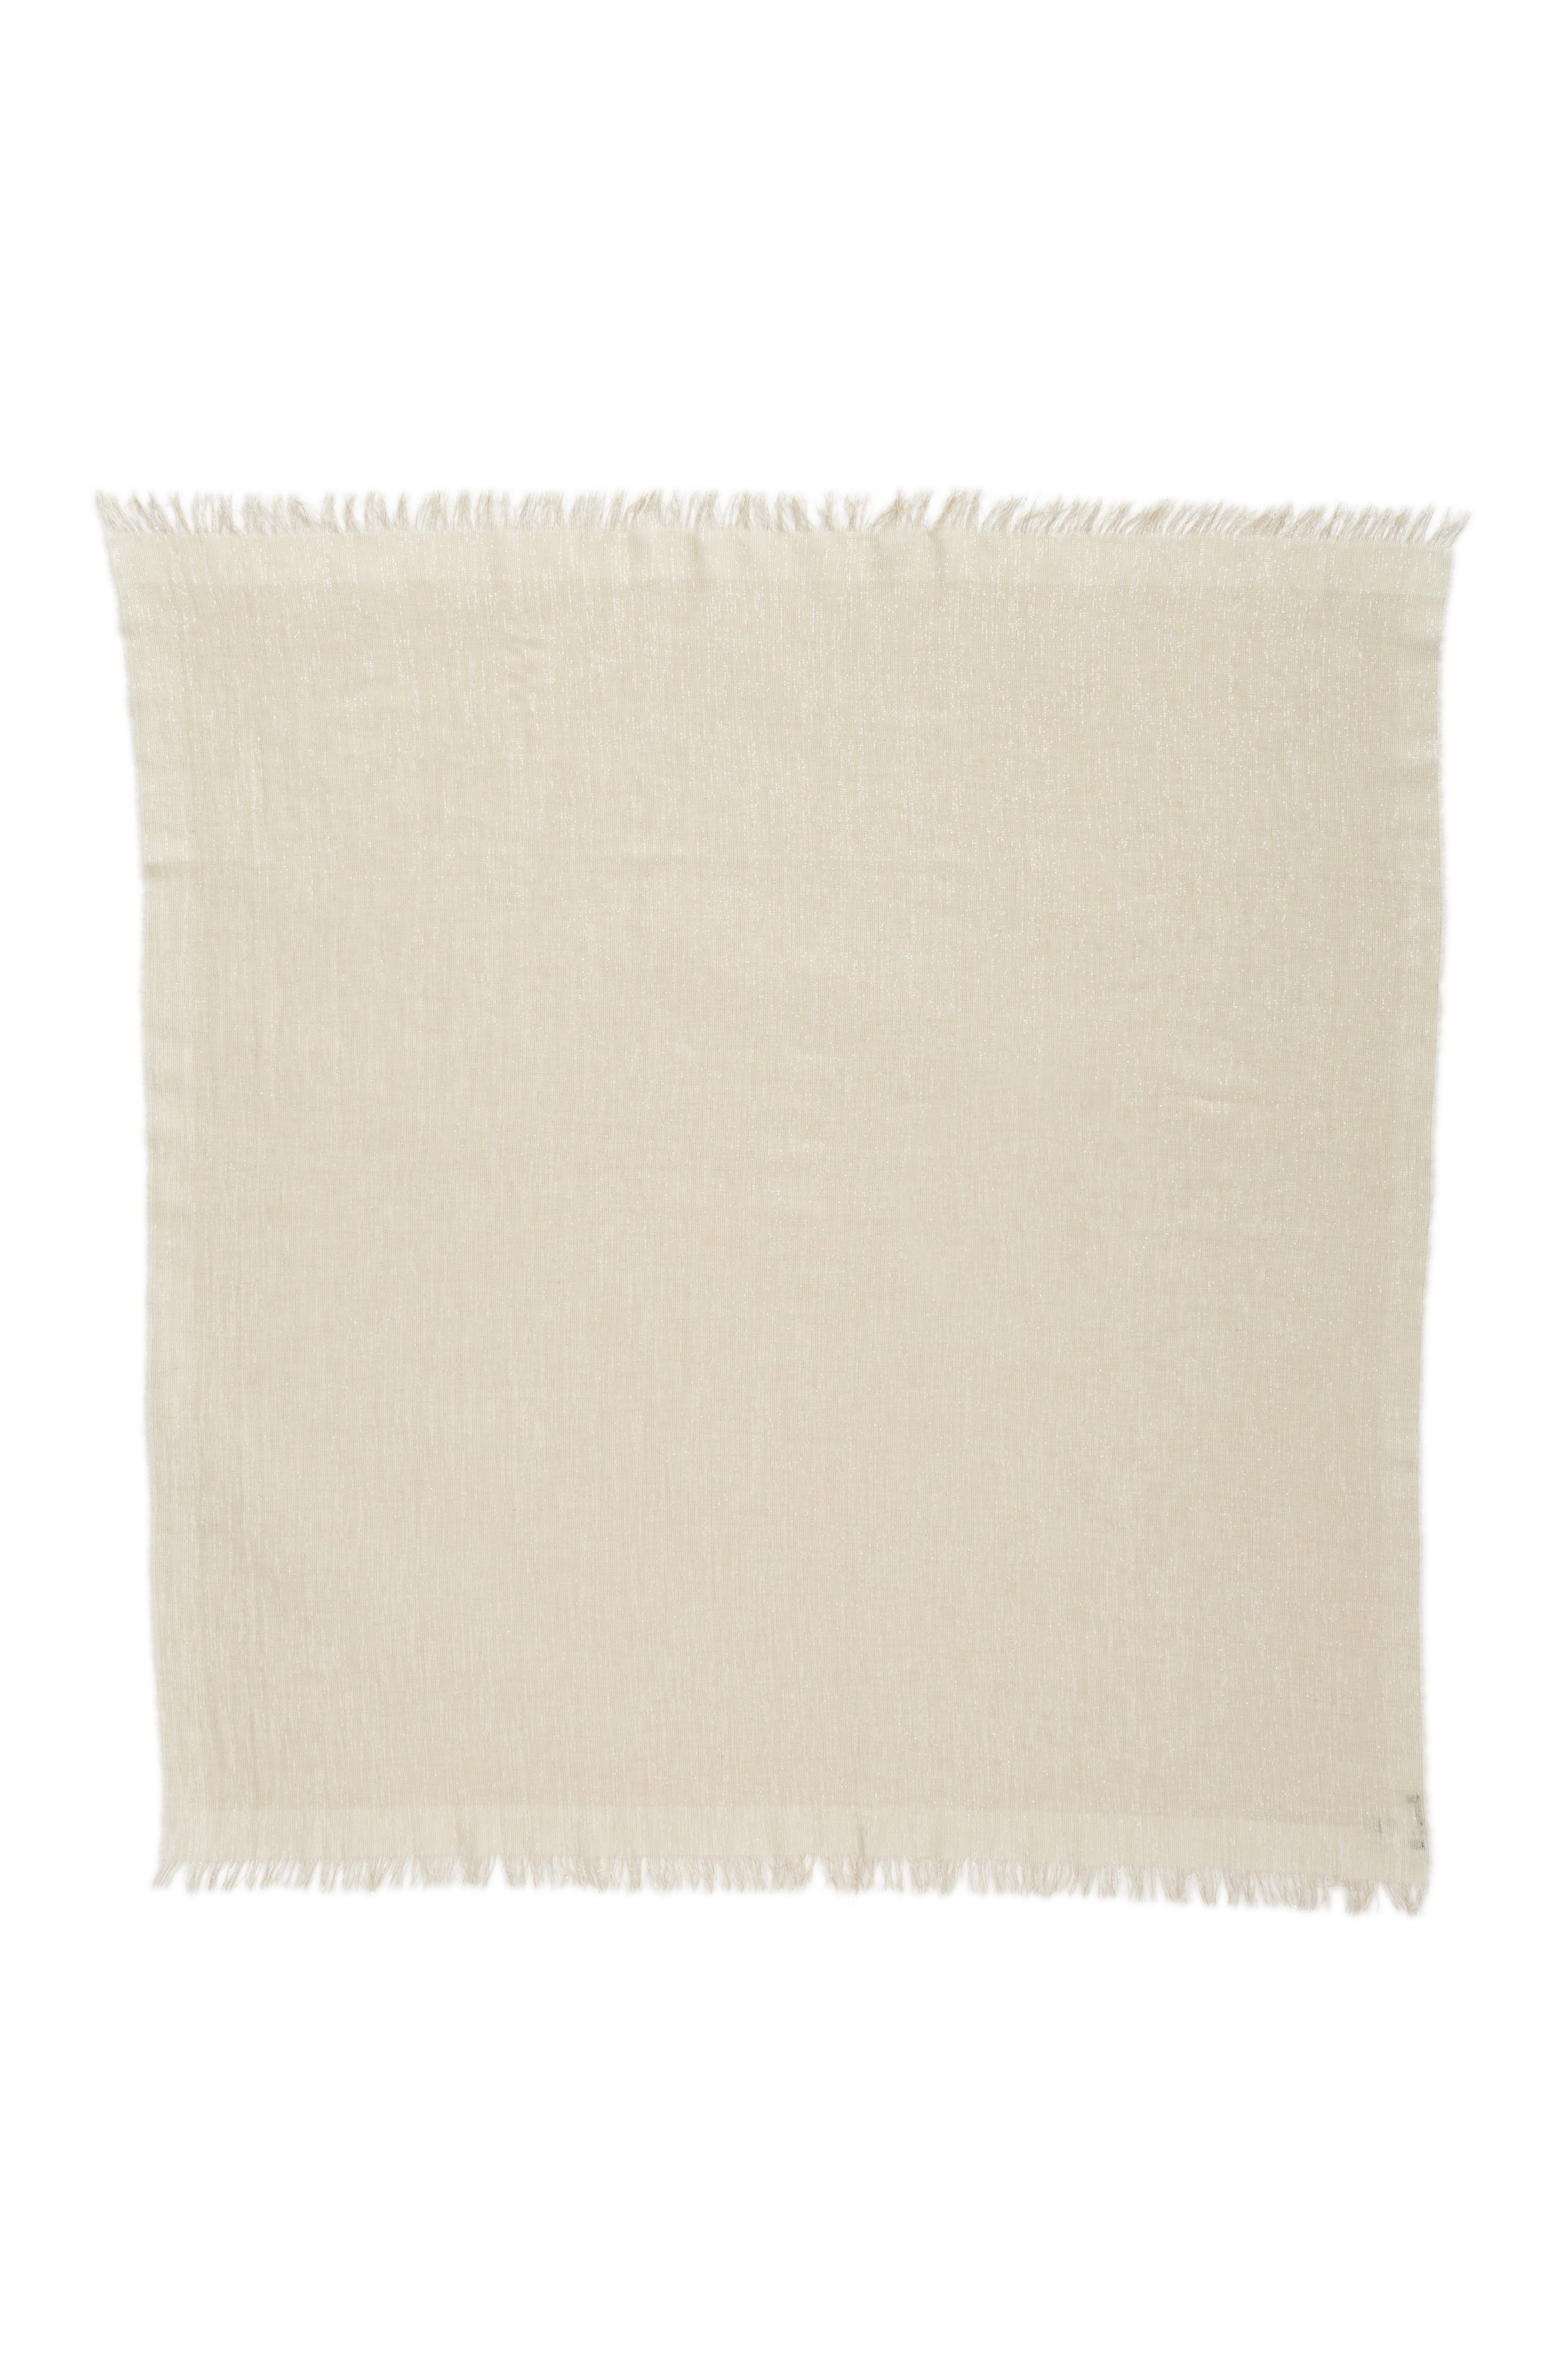 Organic Cotton Blend Wrap,                             Alternate thumbnail 3, color,                             257